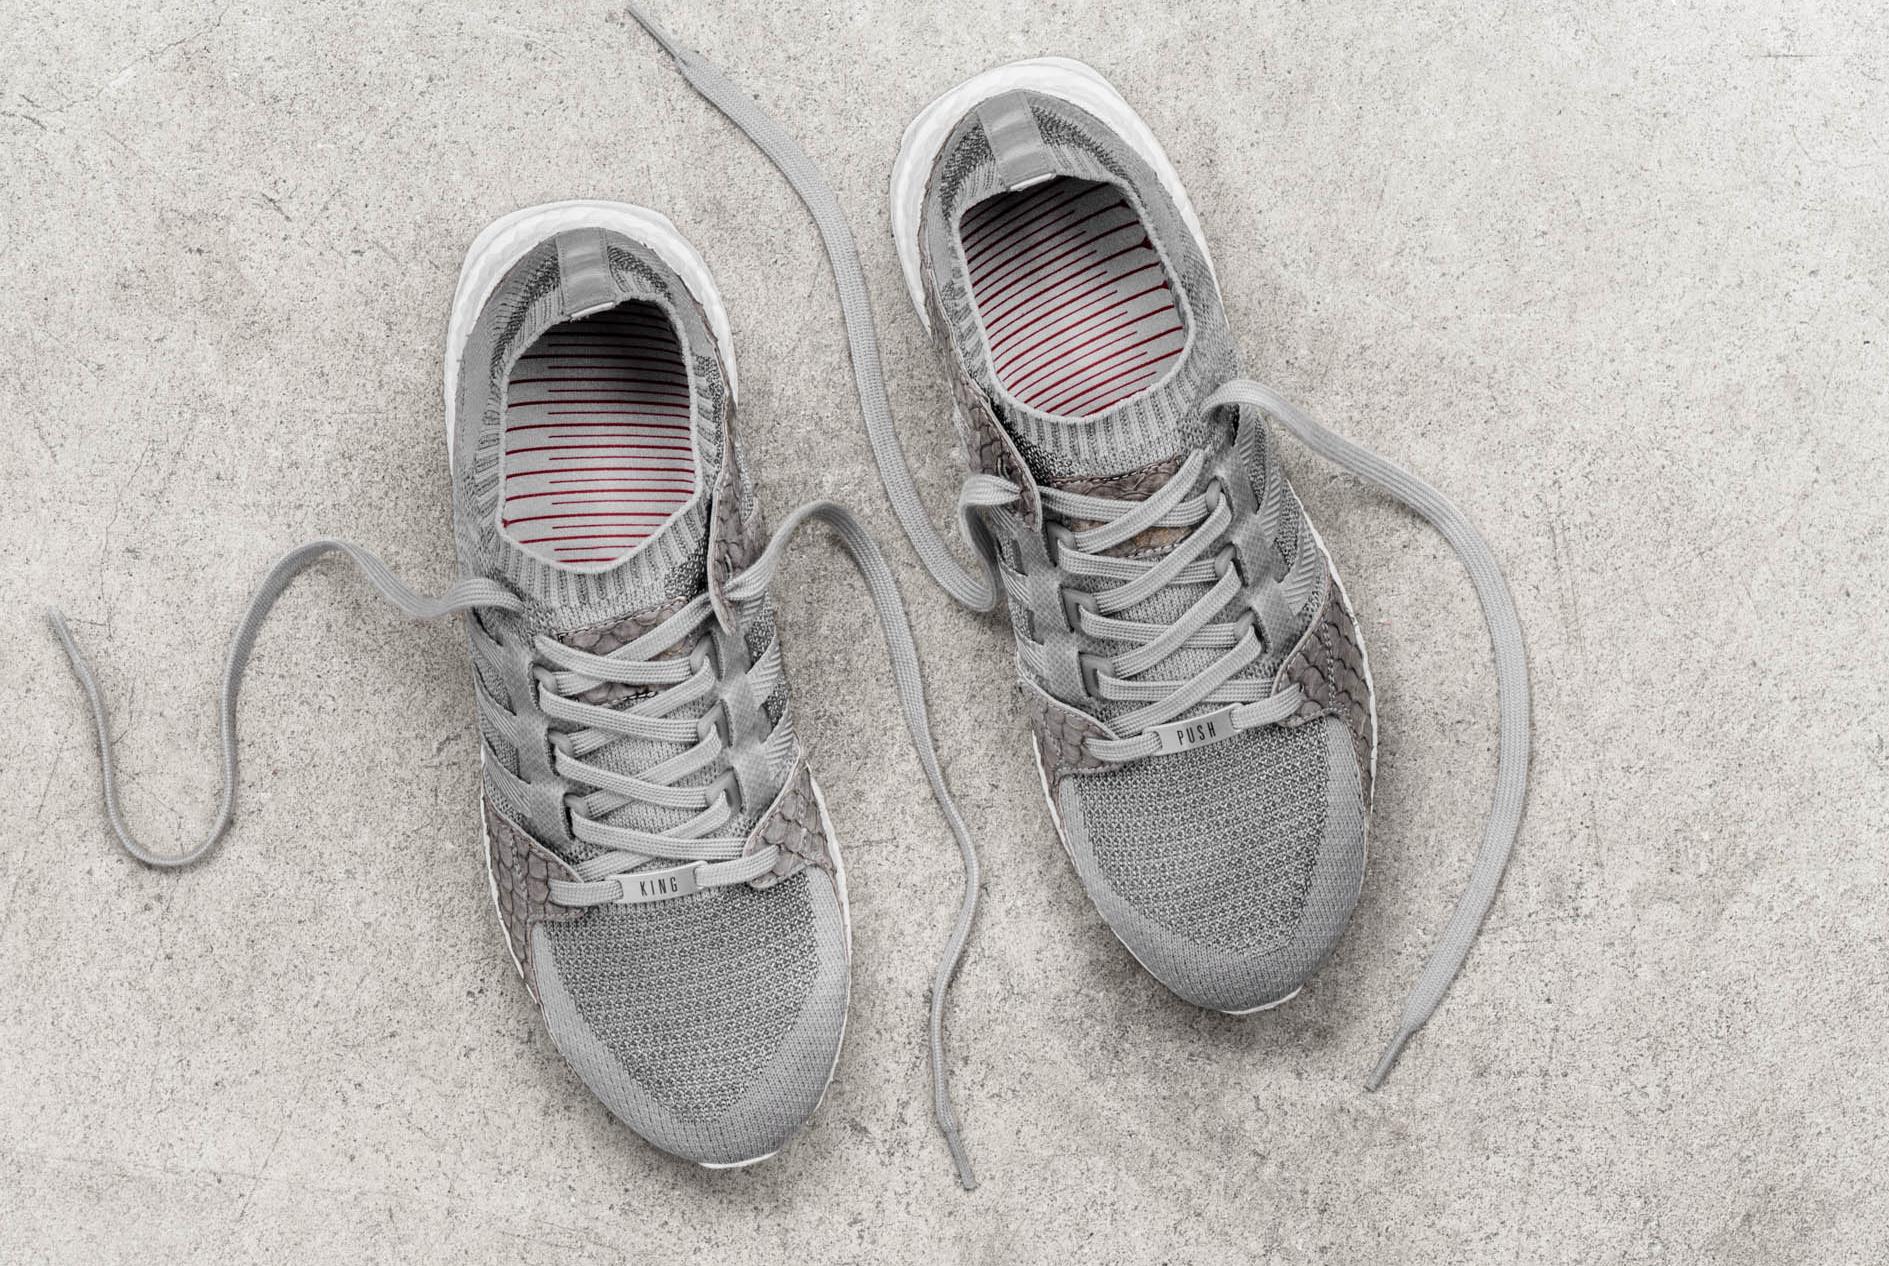 chaussure-pusha-t-x-adidas-equipment-91-16-boost-primeknit-king-push-3